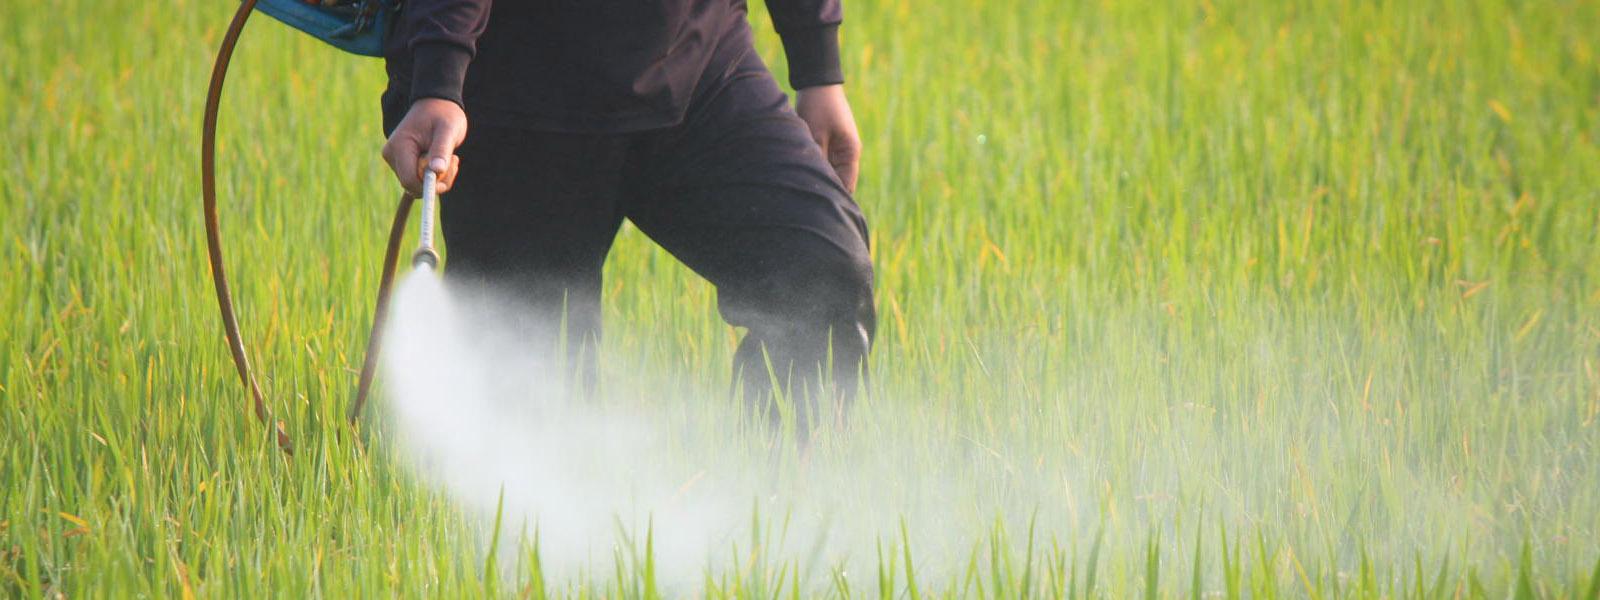 pesticide_testing_in_udaipur